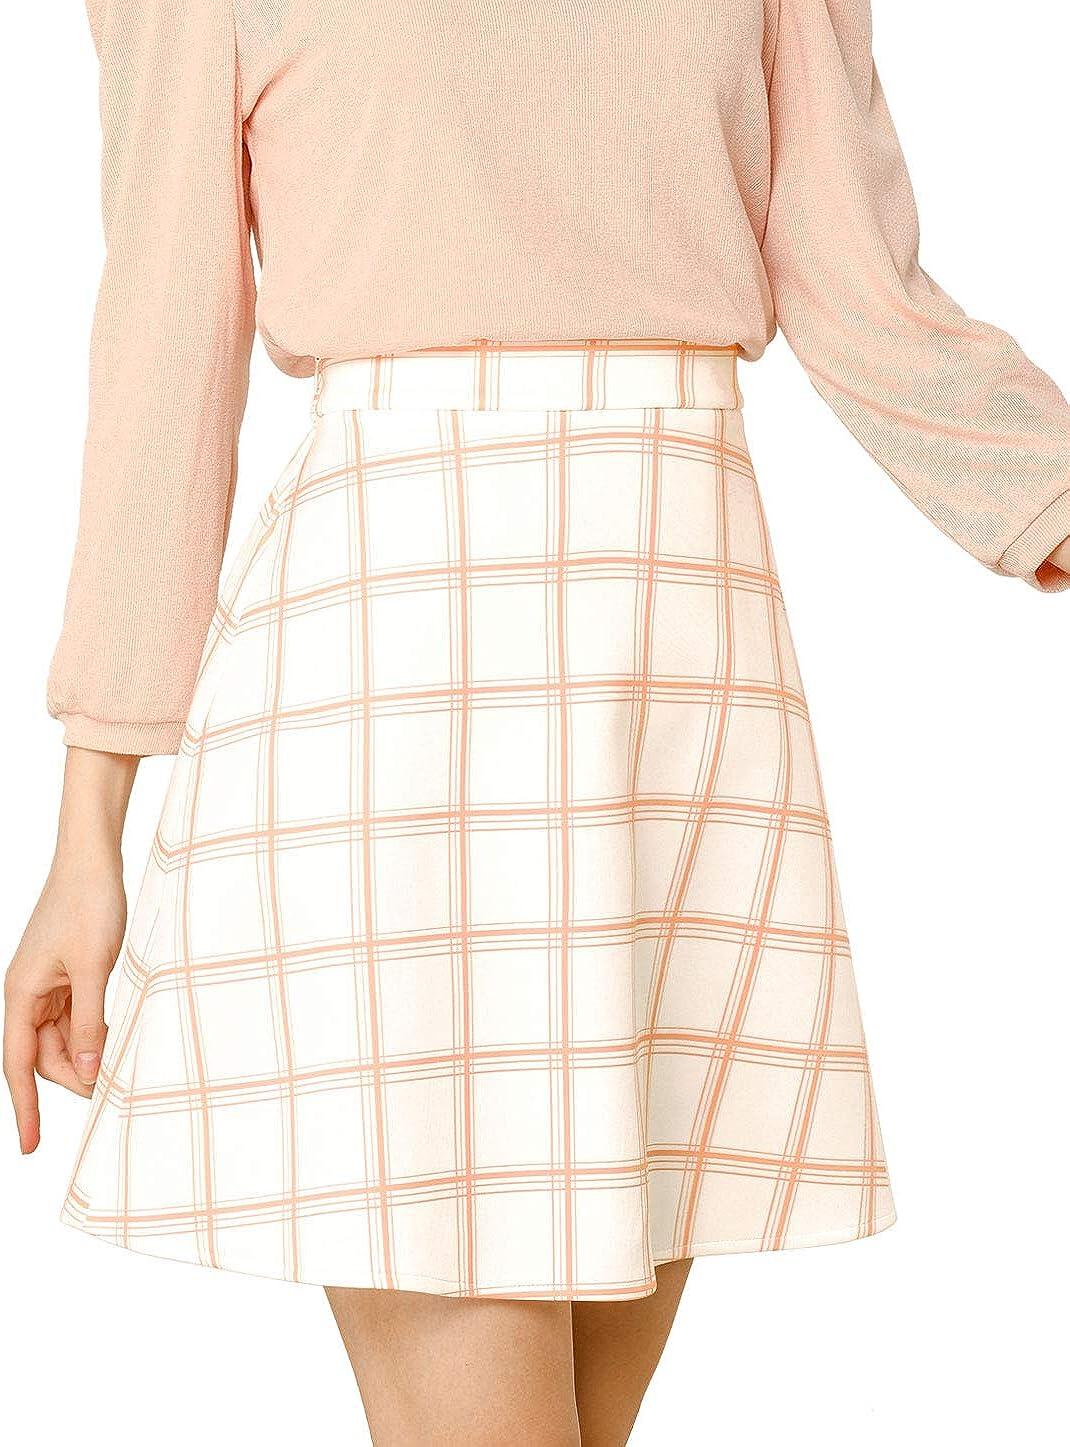 Allegra K Women's Plaid High Waist Stretchy Above The Knee A-Line Skirt